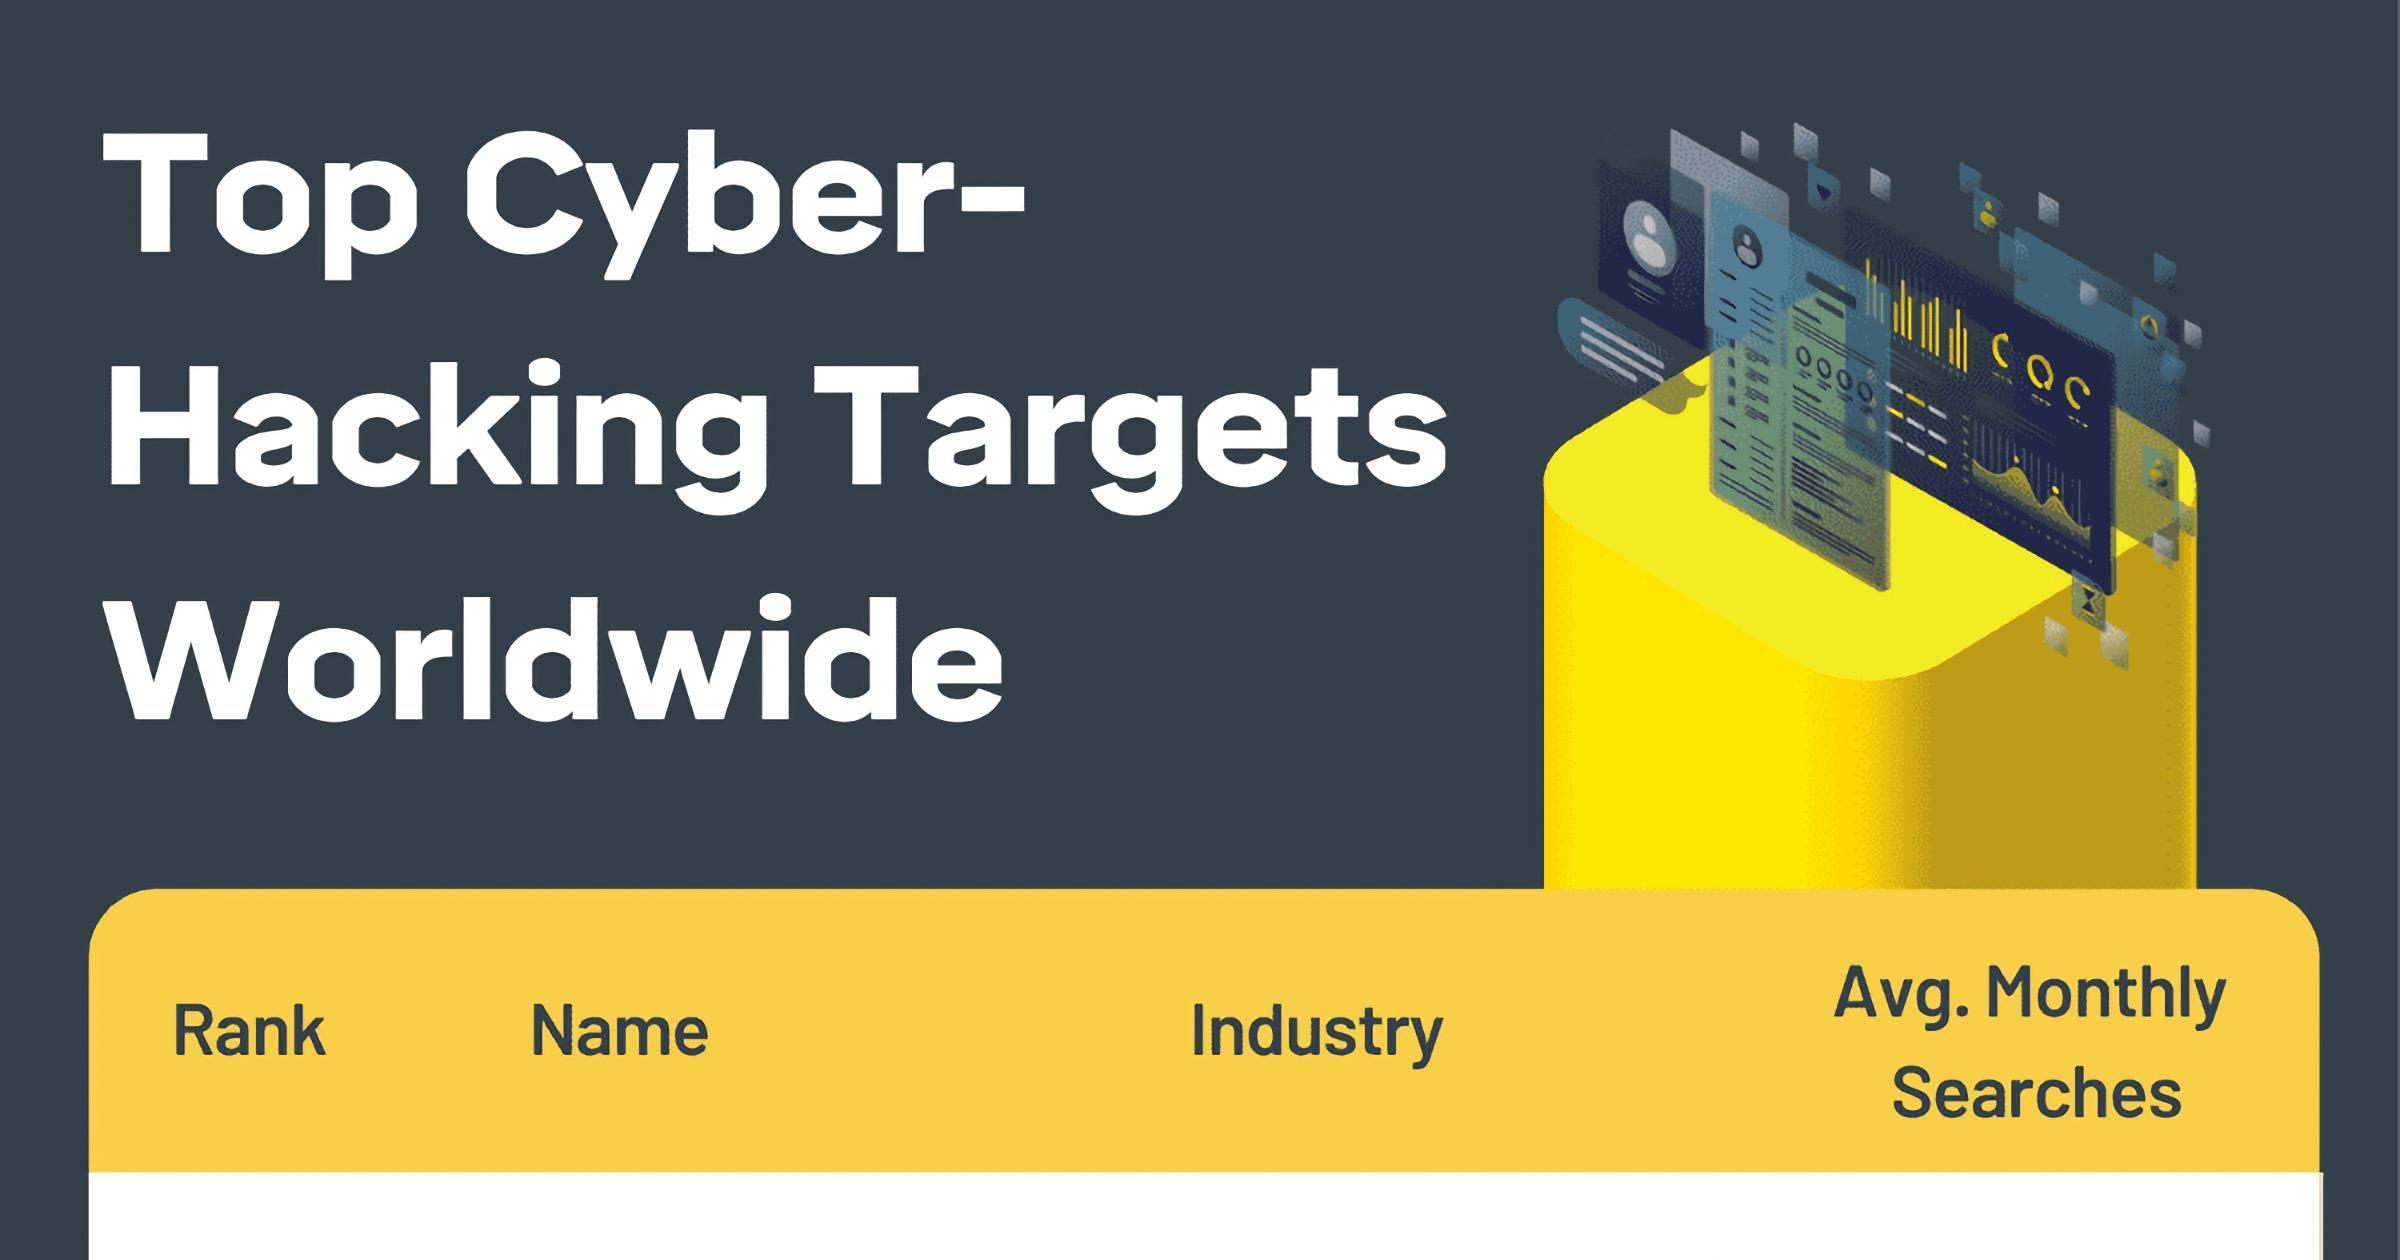 Top hacking targets worldwide